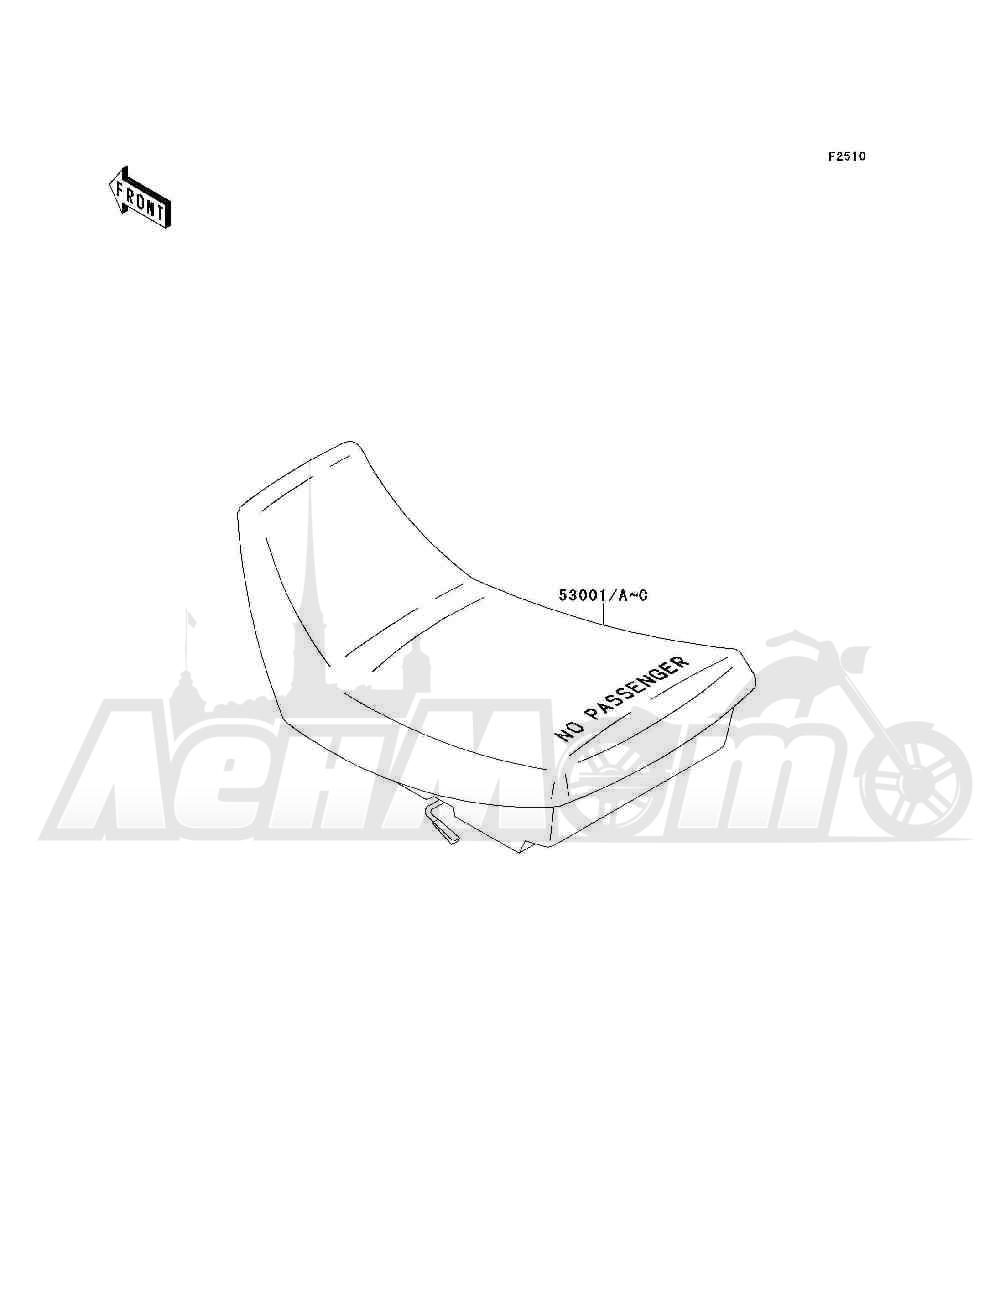 Запчасти для Квадроцикла Kawasaki 1994 BAYOU 300 4X4 (KLF300-C6) Раздел: SEAT | сиденье